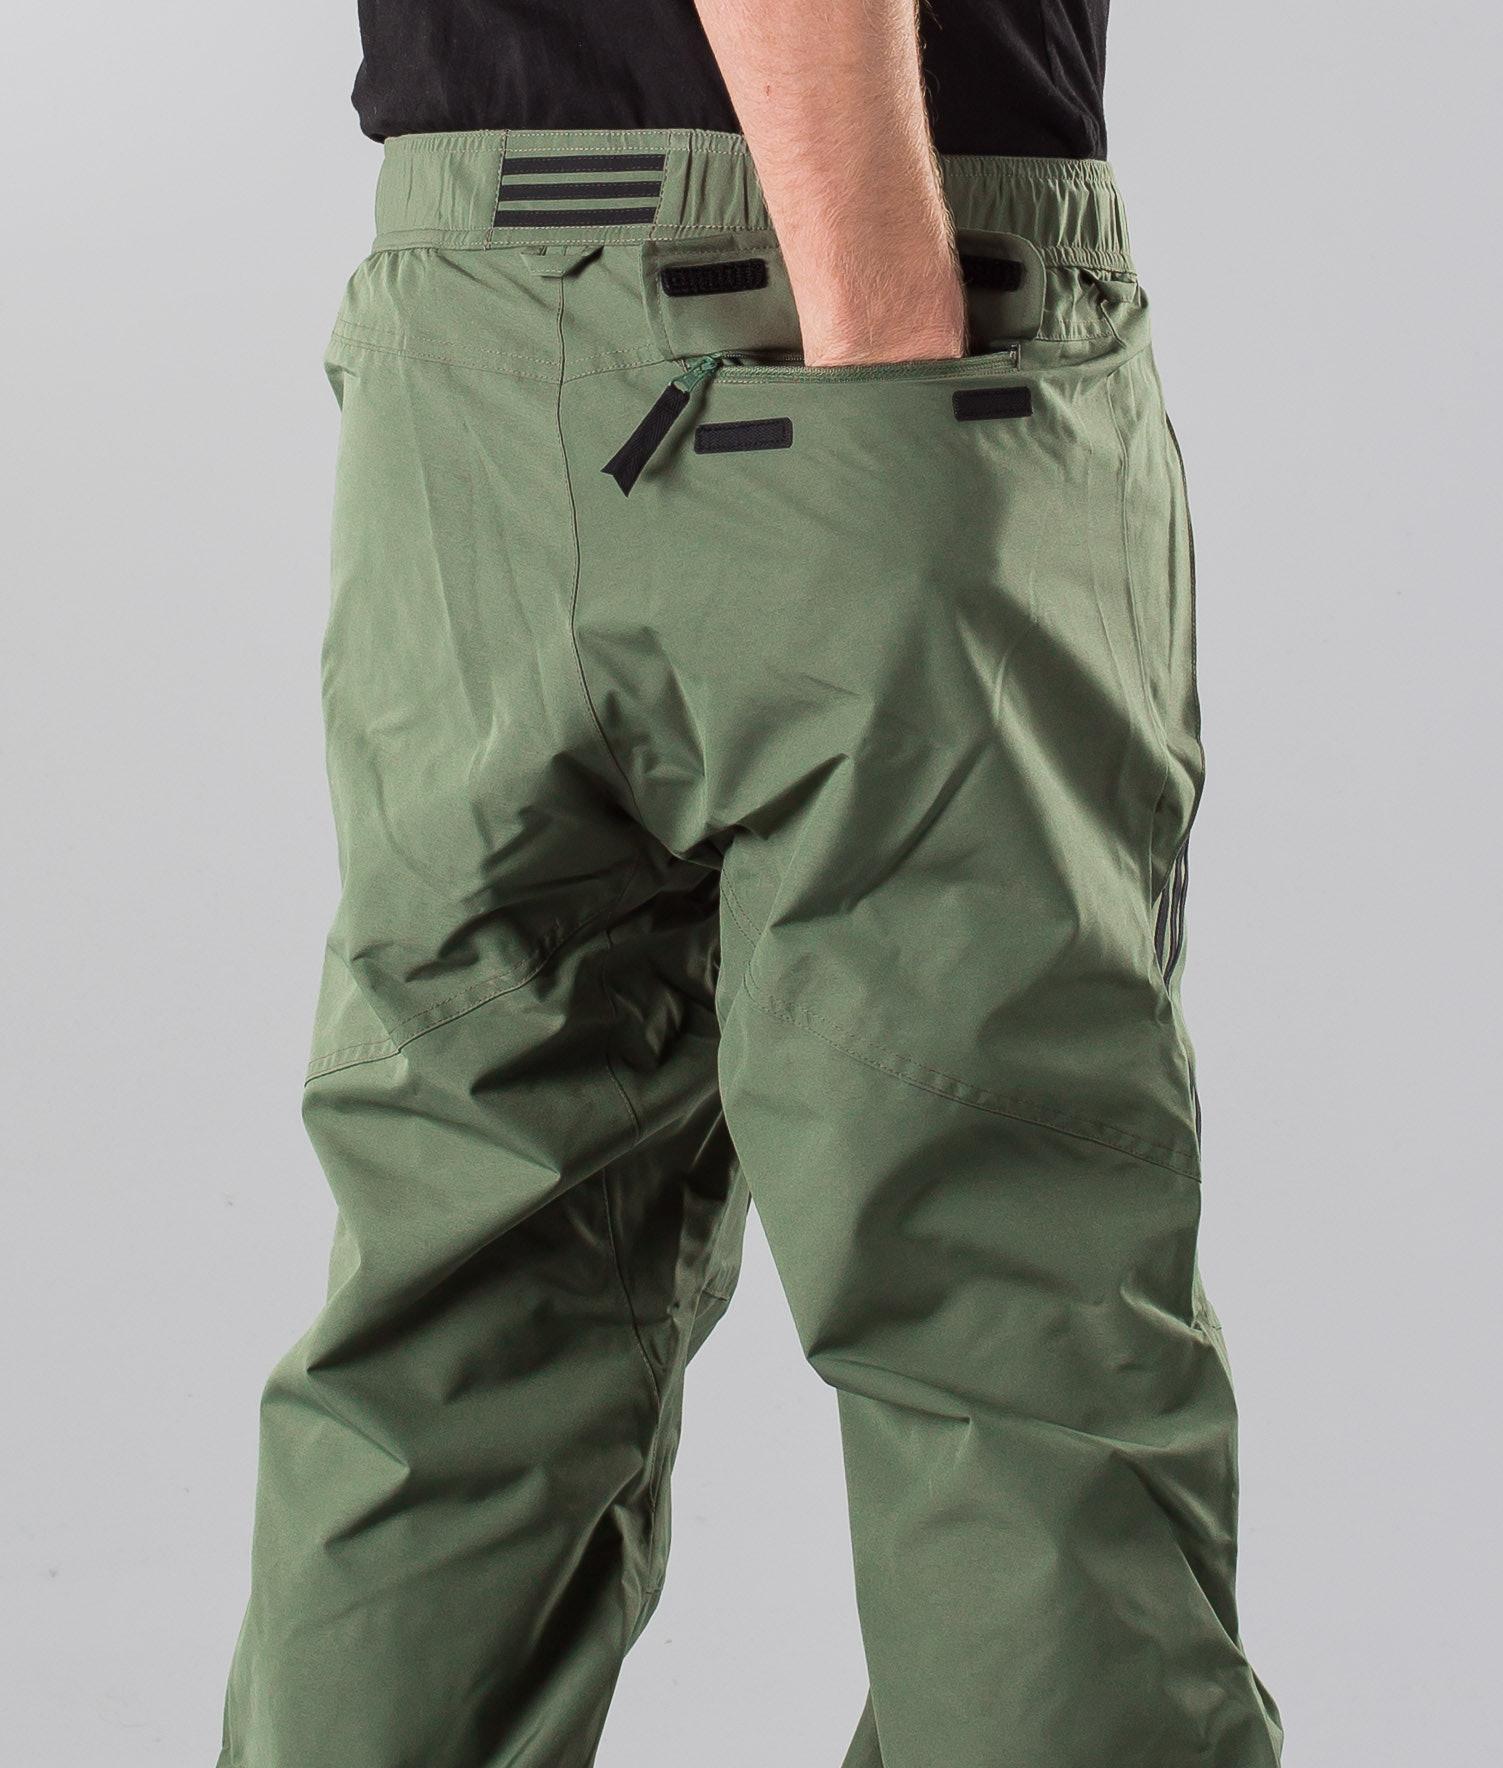 f35aa88416339 Adidas Snowboarding Riding Pant Snow Pants Base Green/Black ...